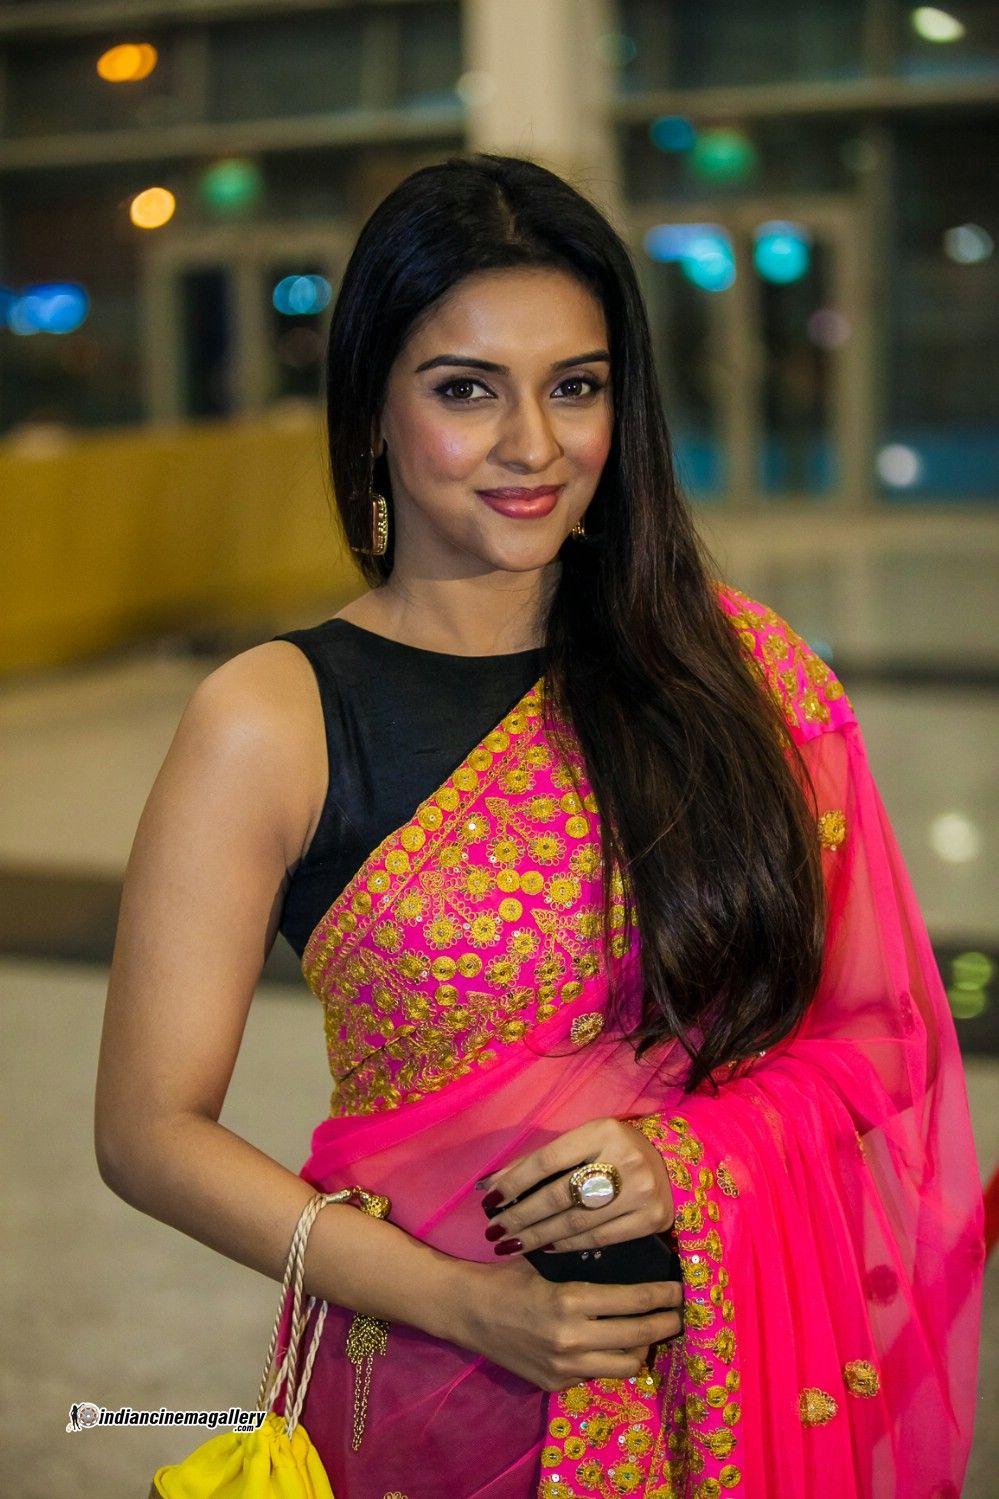 Commit Deepa venkat hot fakes pity